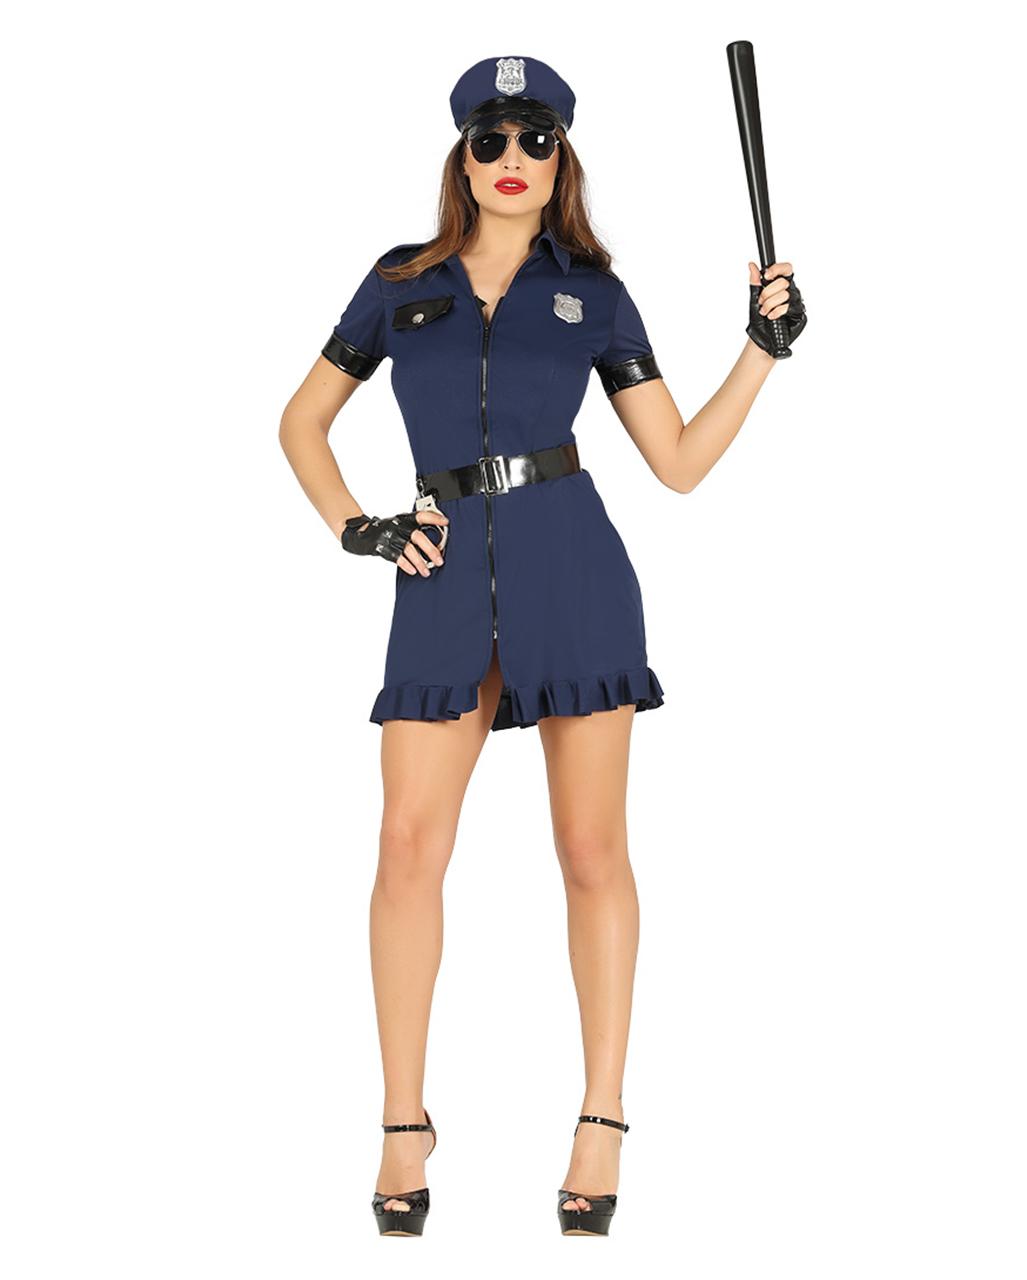 Policewoman Costume Black Blue For Halloween Horror Shop Com